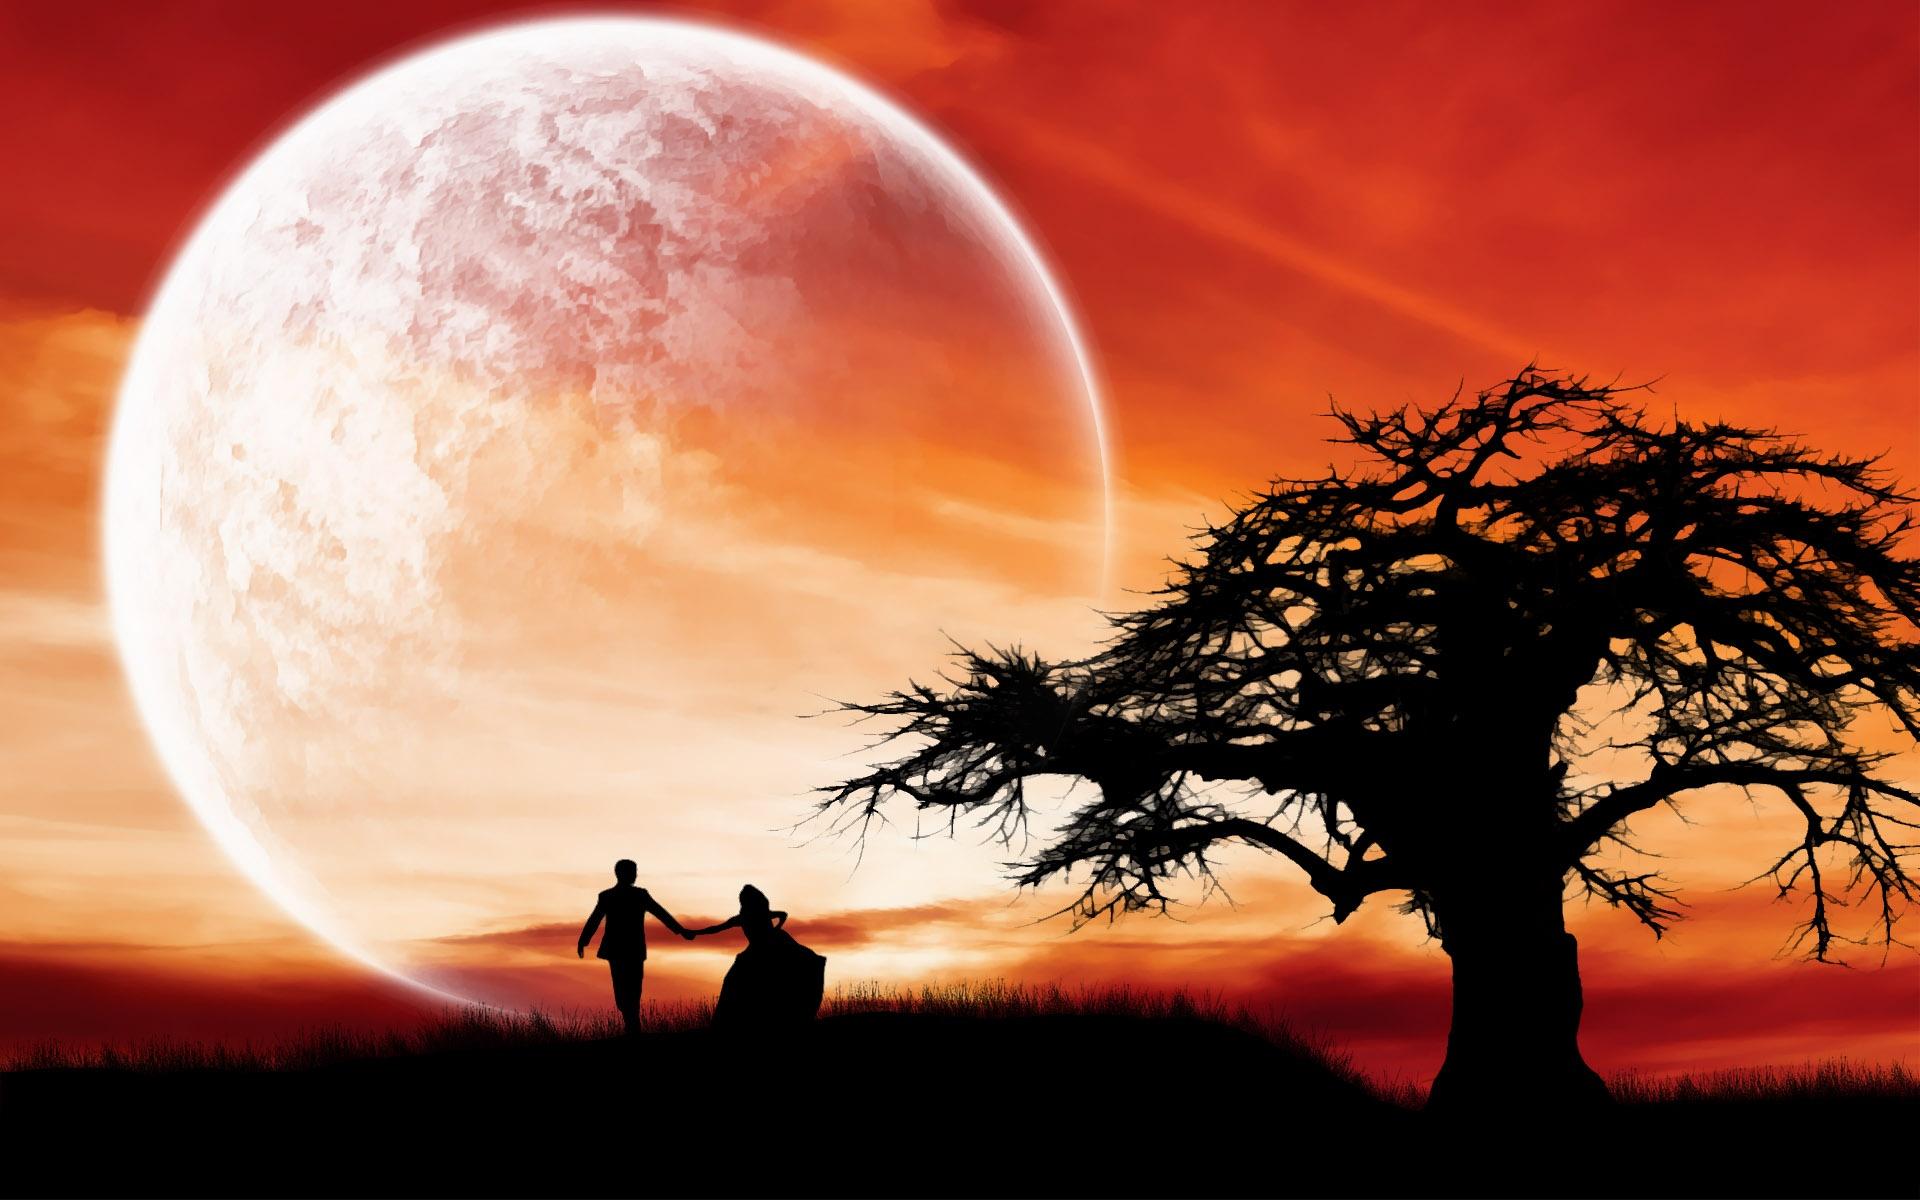 hd-love-couple-wallpaper-supermoon-romantic-night-x